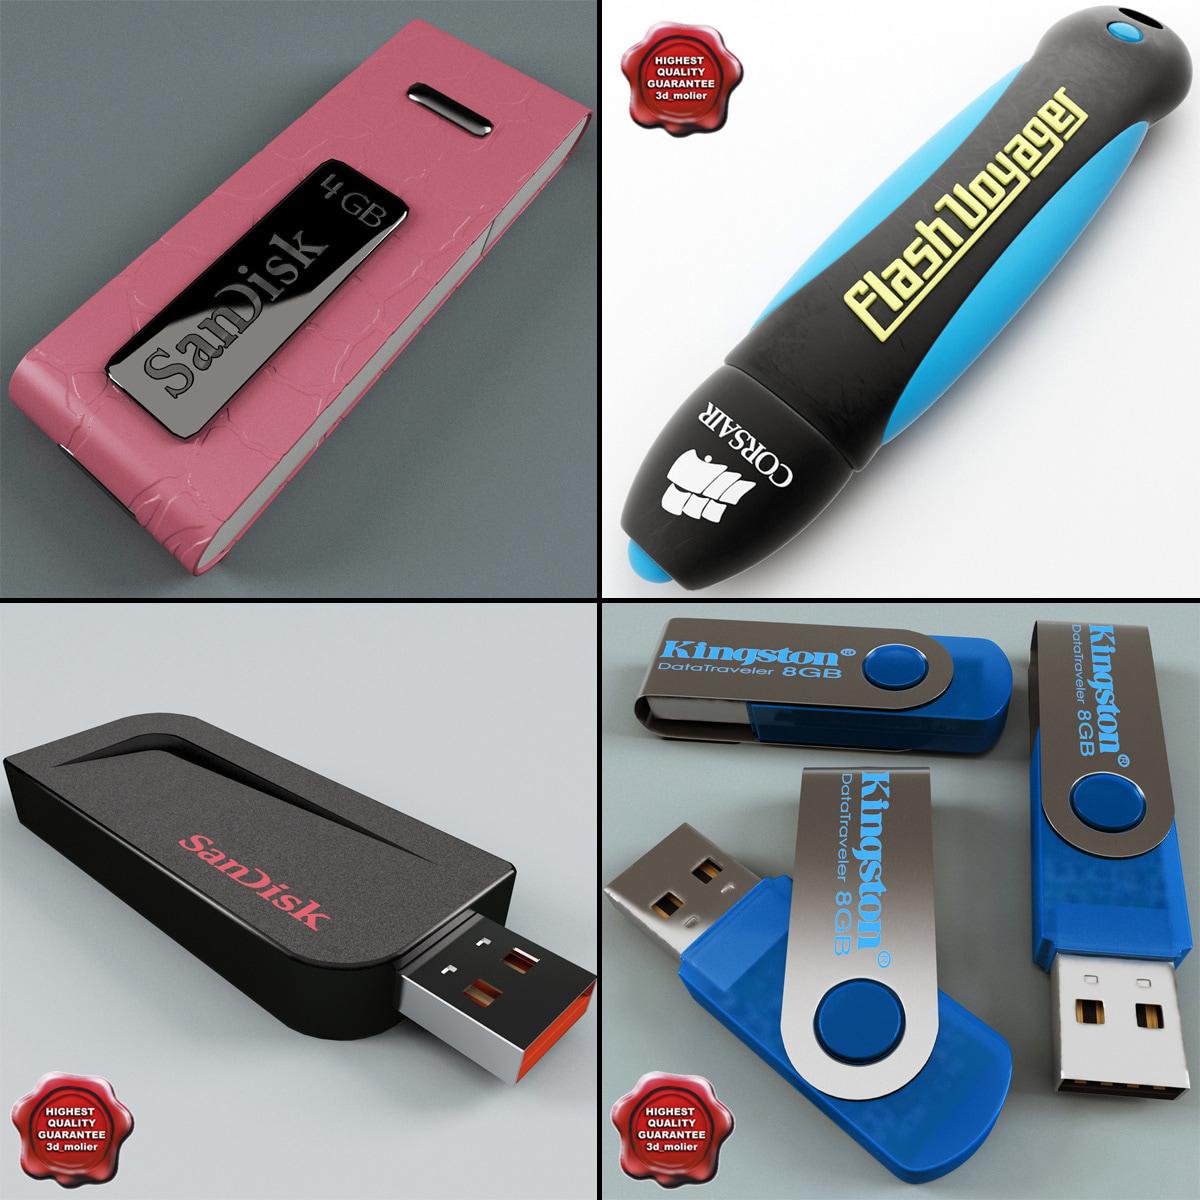 USB_Flash_Drives_Collection_V2_00.jpg